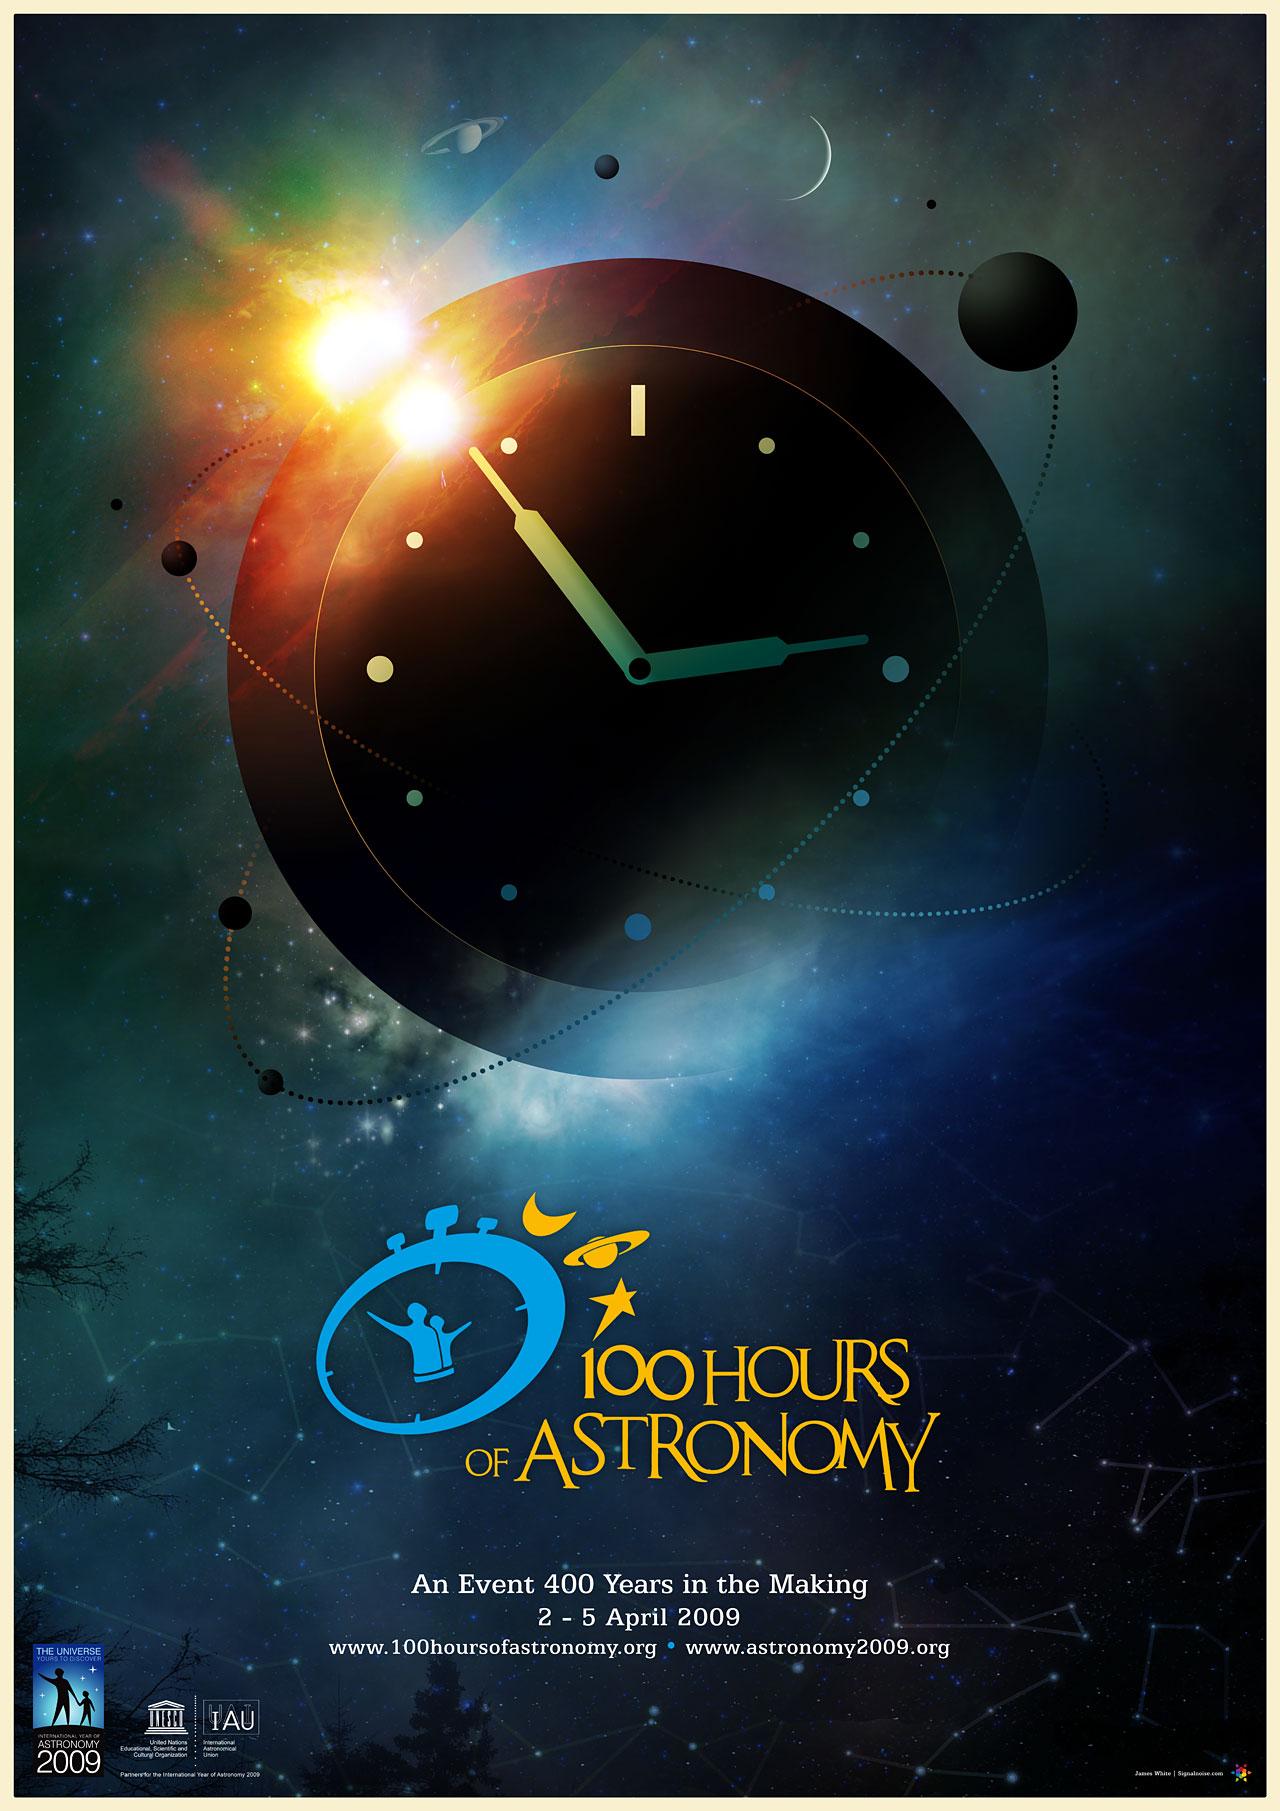 100 Hours of Astronomy | Astronomy 2009